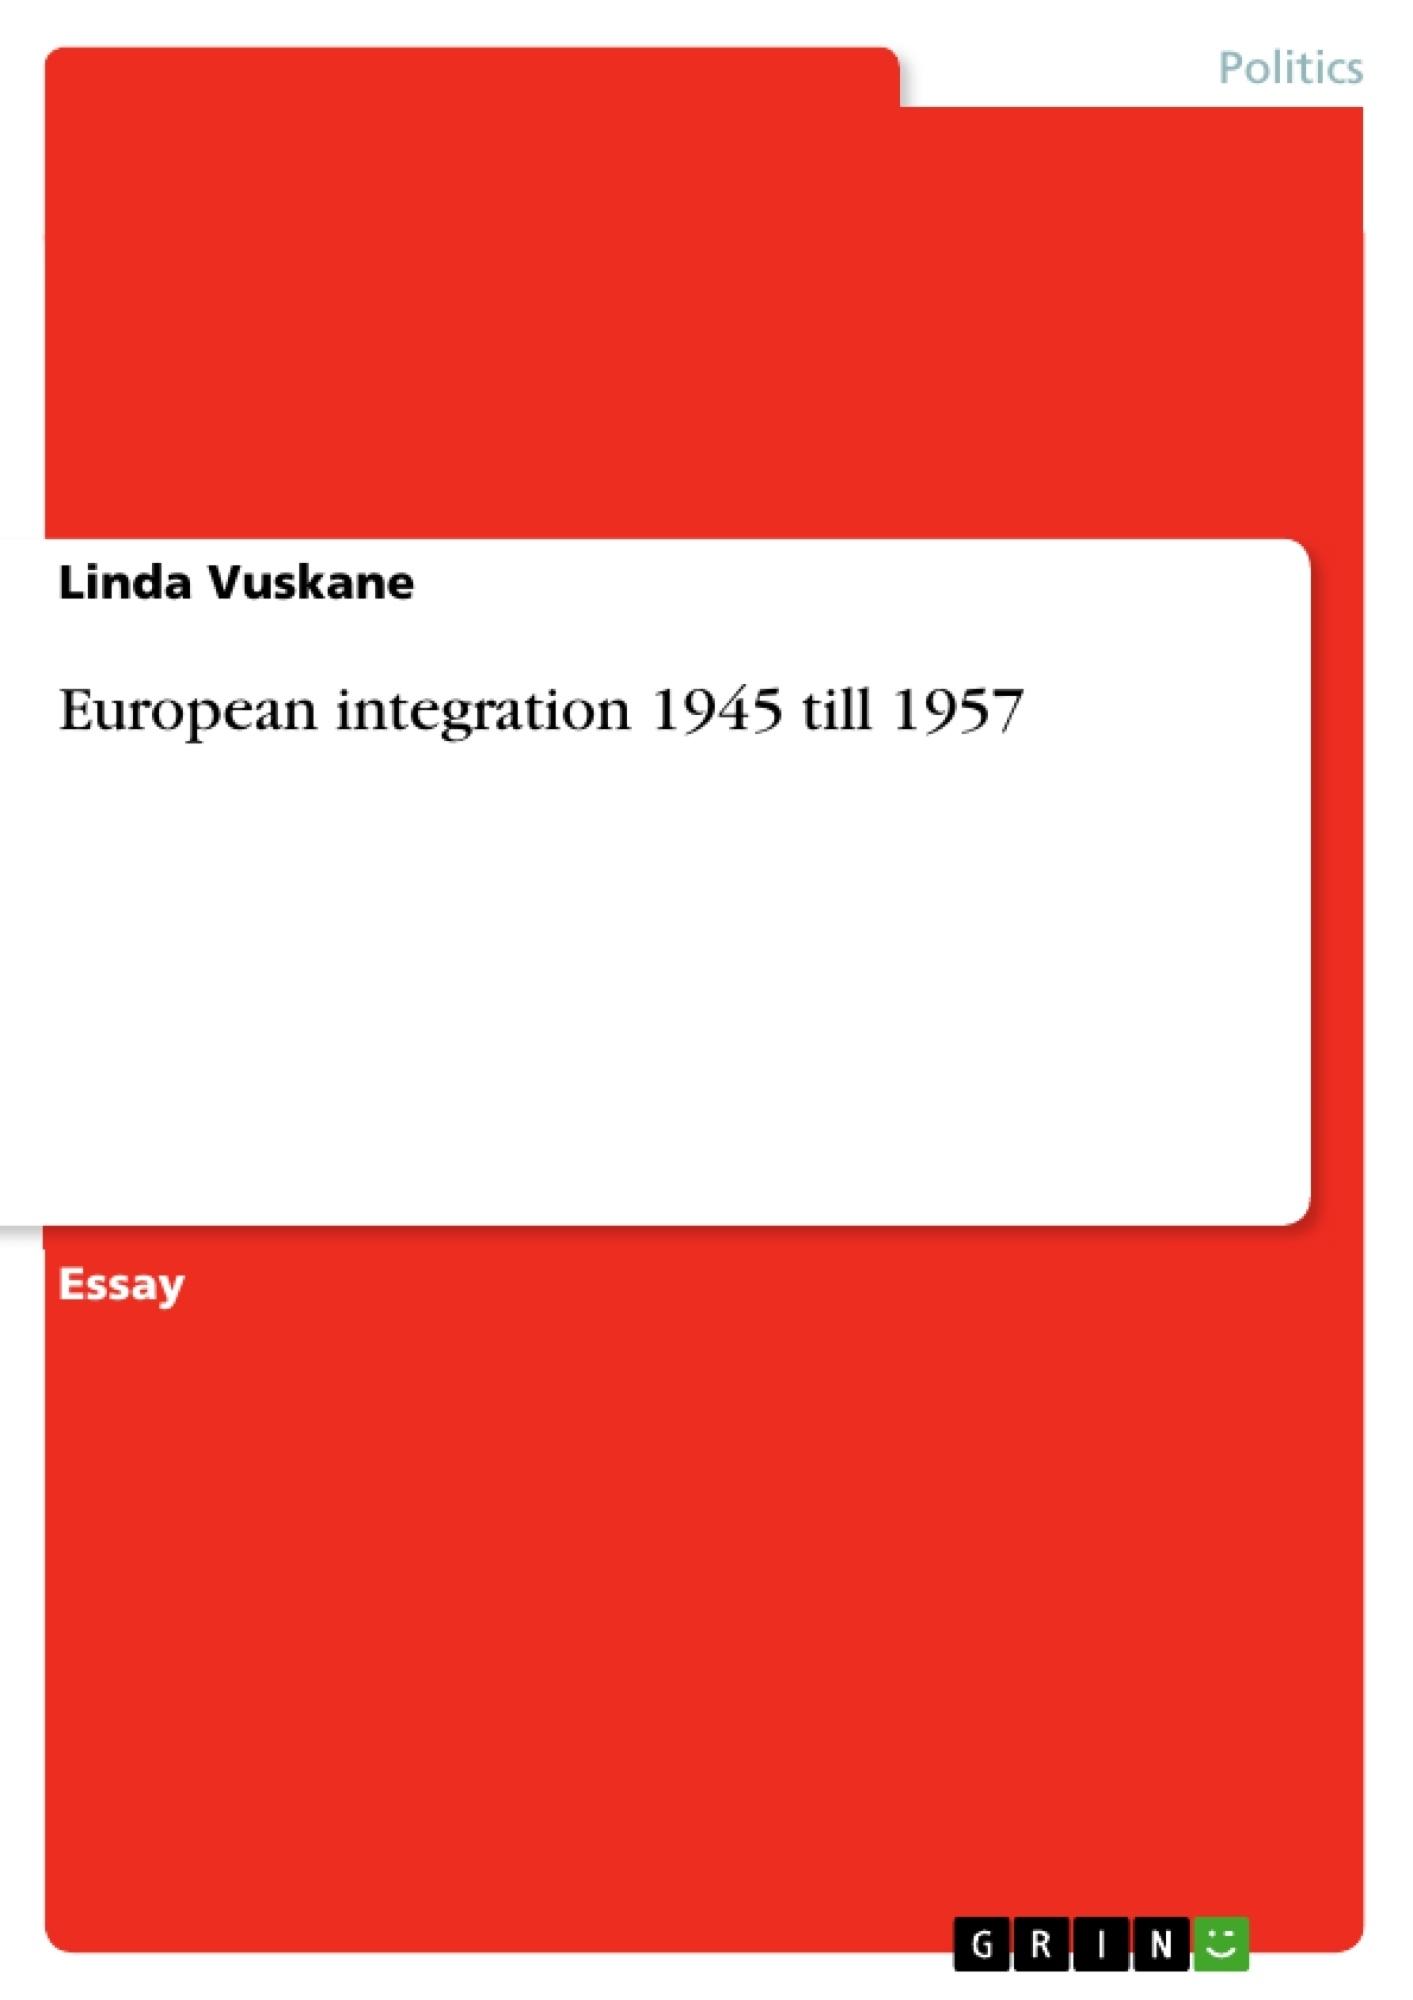 Essays in European integration and economic inequalities